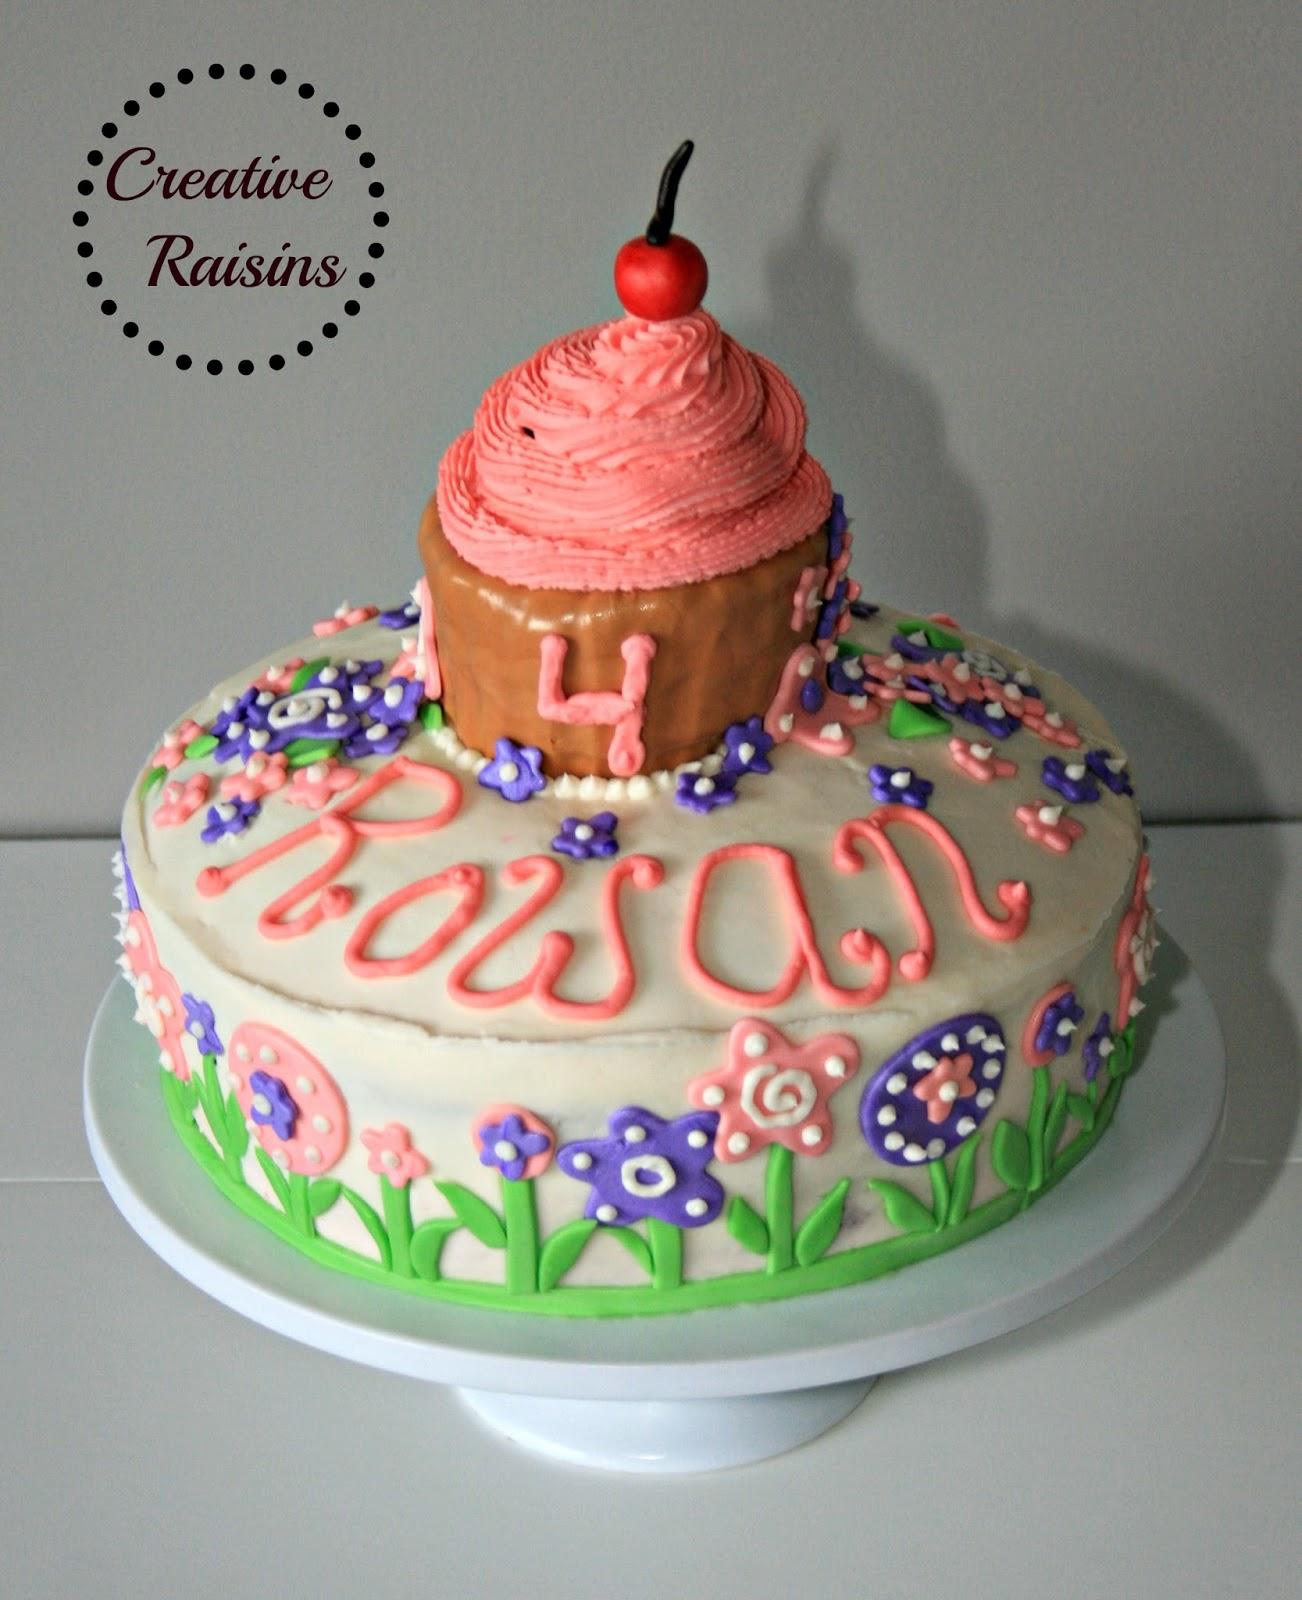 Pinkalicious Cake Images : Creative Raisins: Pinkalicious Birthday Cake